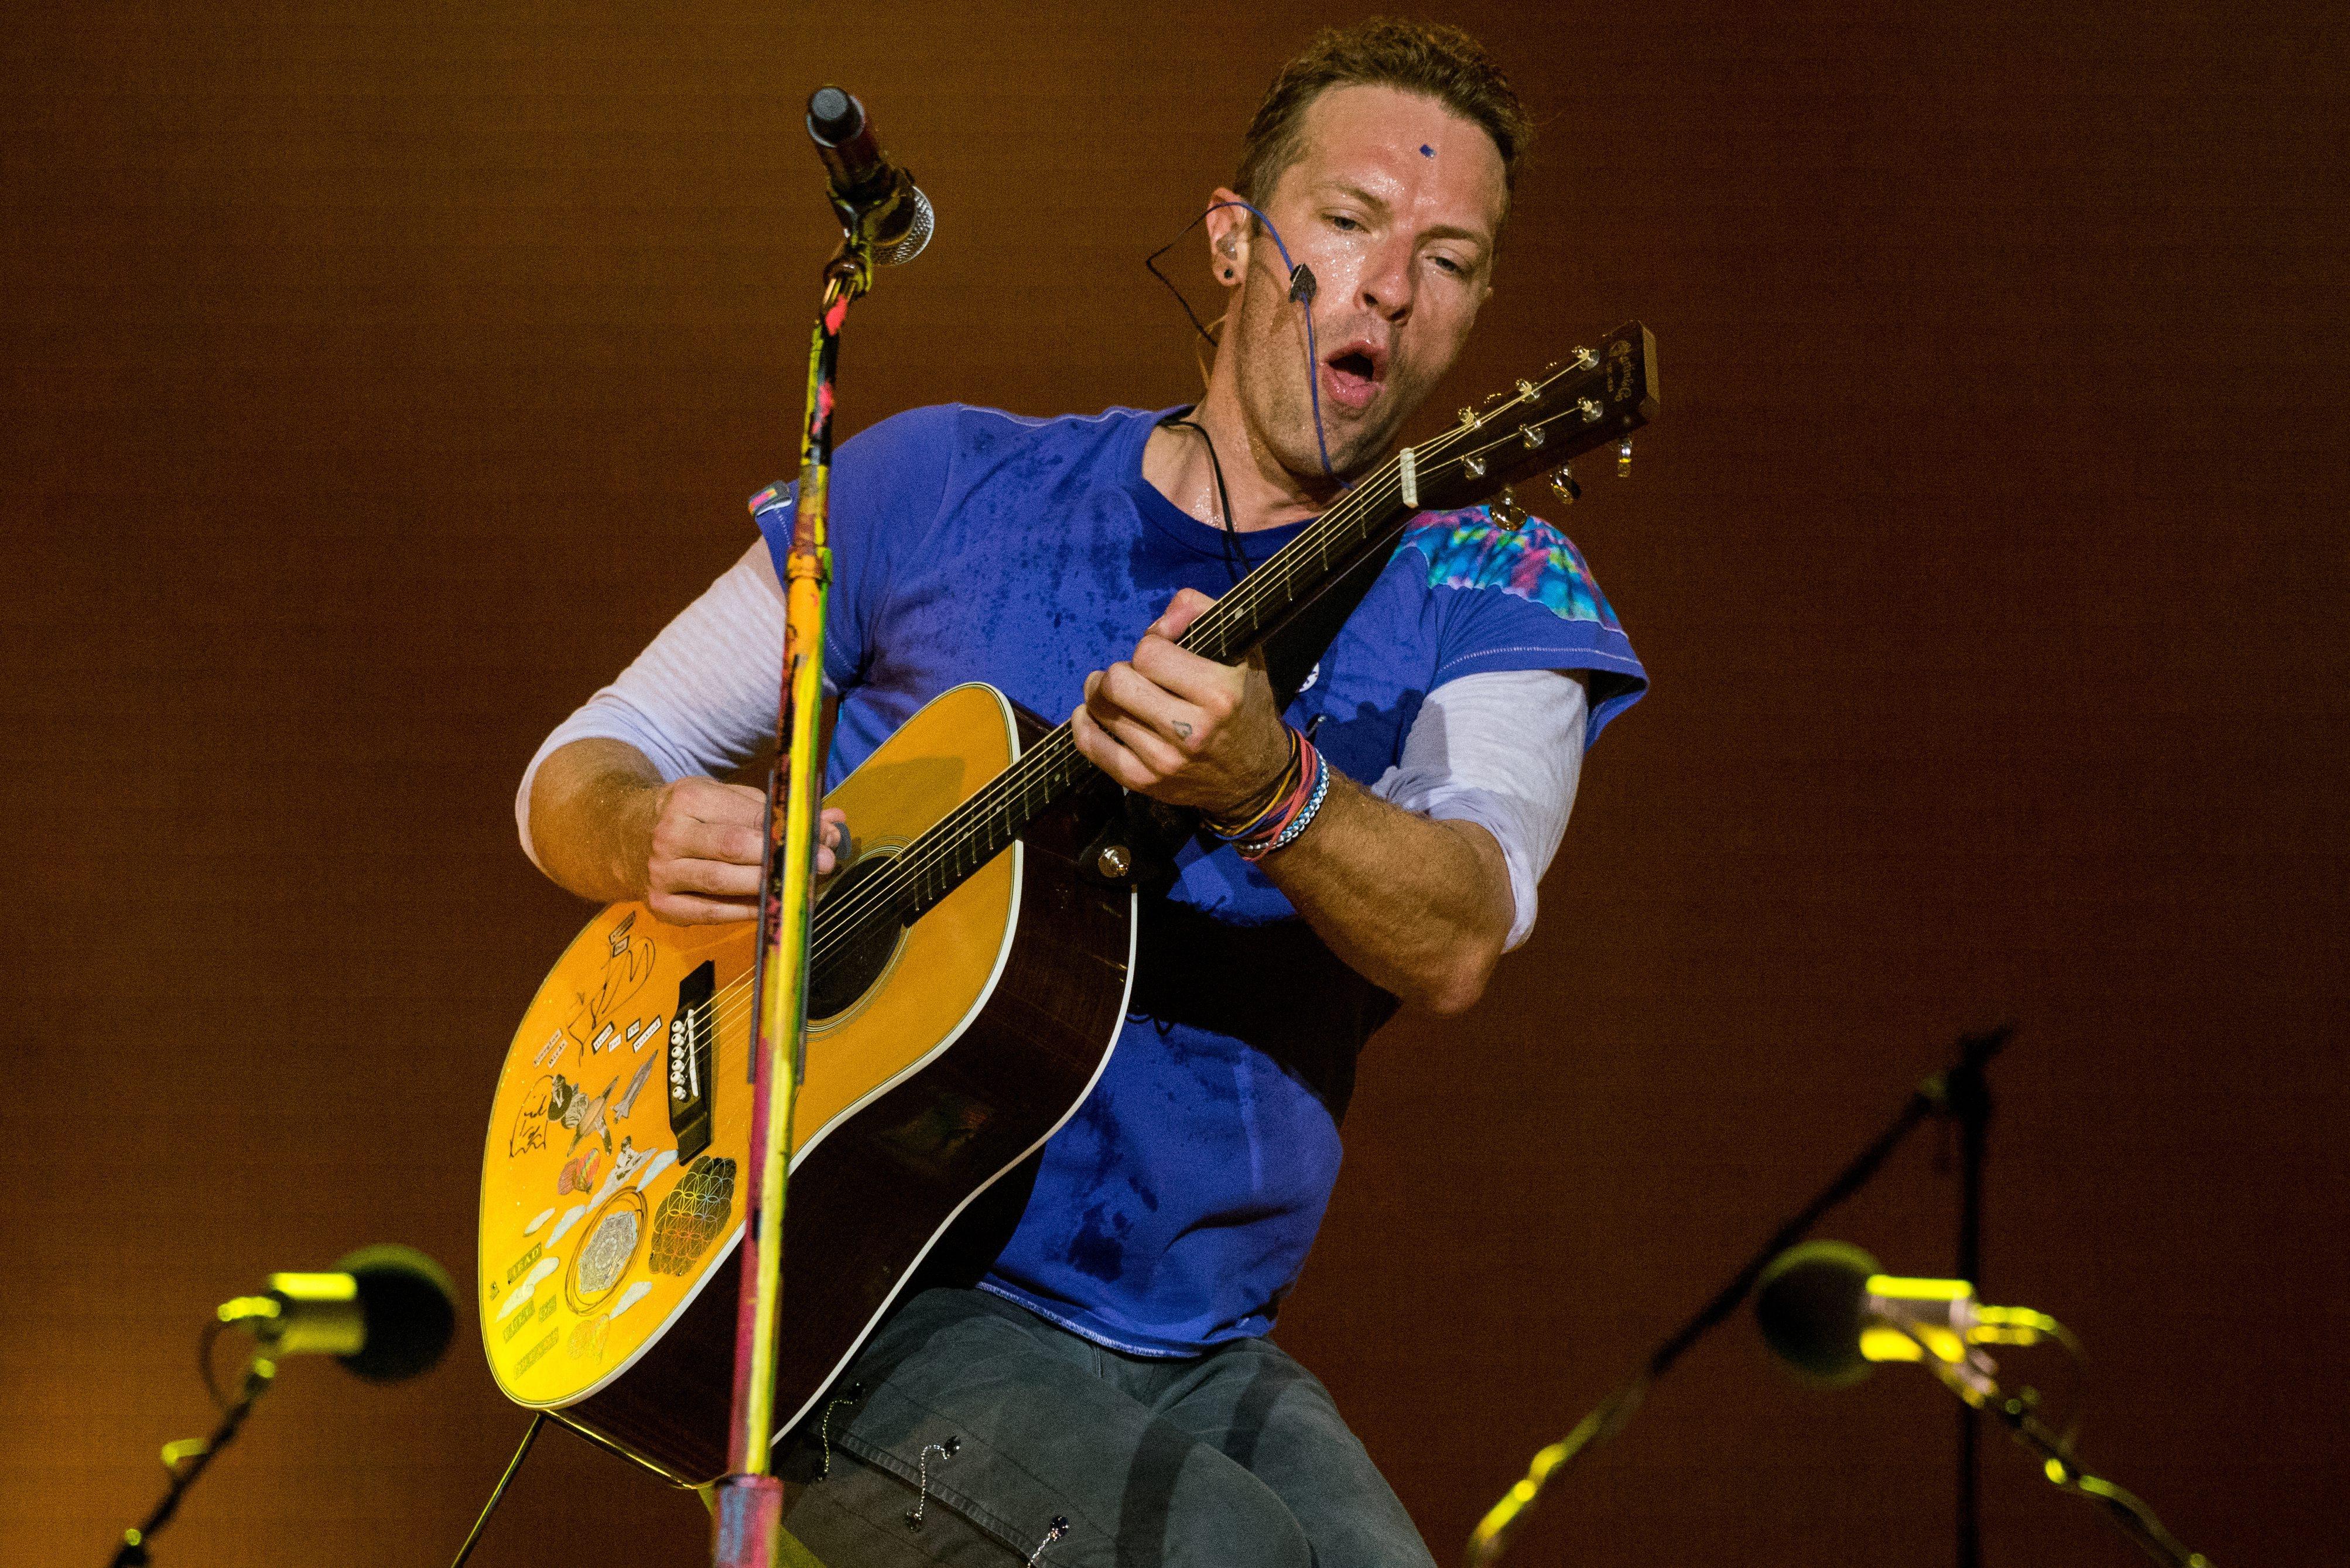 Крис Мартин от Coldplay ->->->